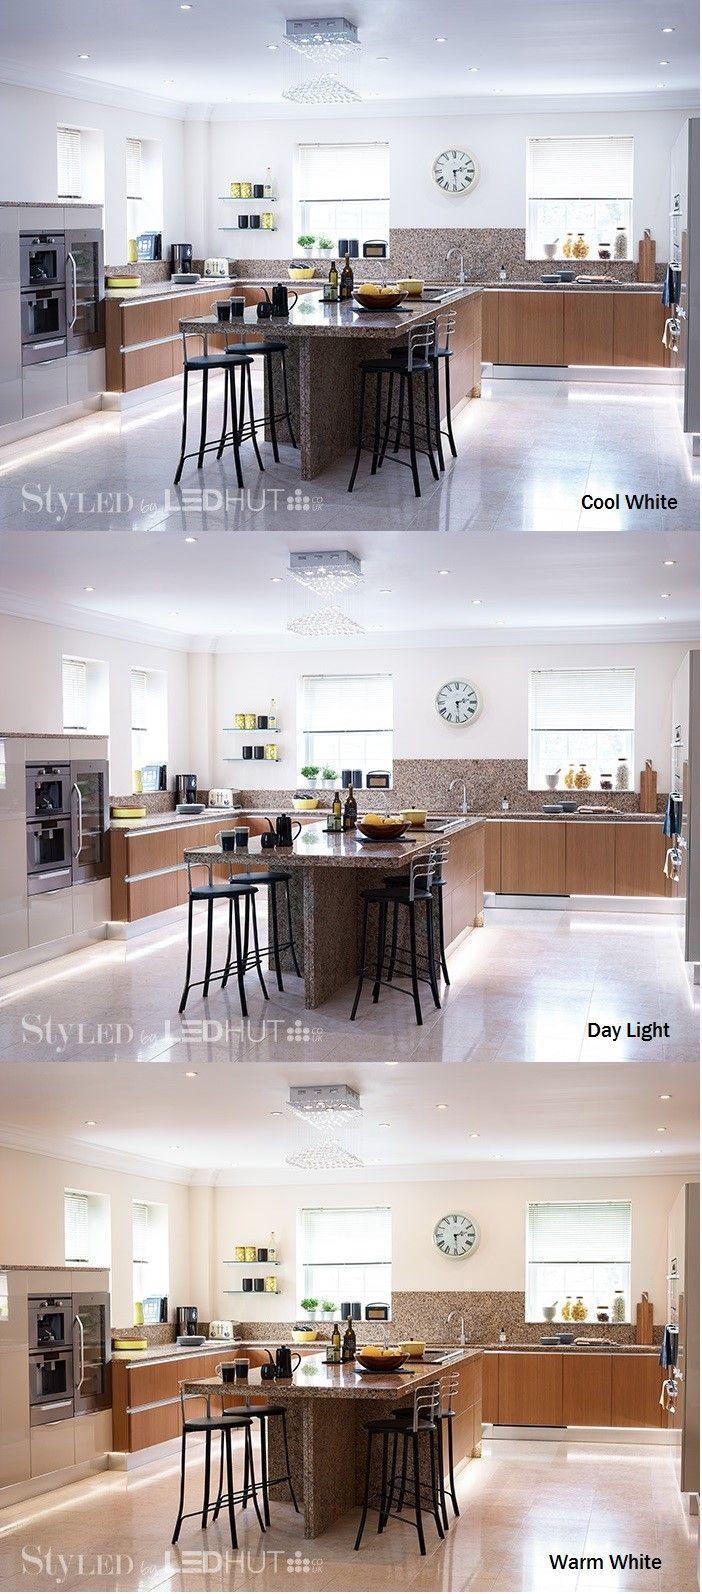 Warm Light Vs Daylight : light, daylight, Lights,, Bulbs, Loads, Amazing, Prices, Kitchen, Colors,, Lighting,, Lighting, Design